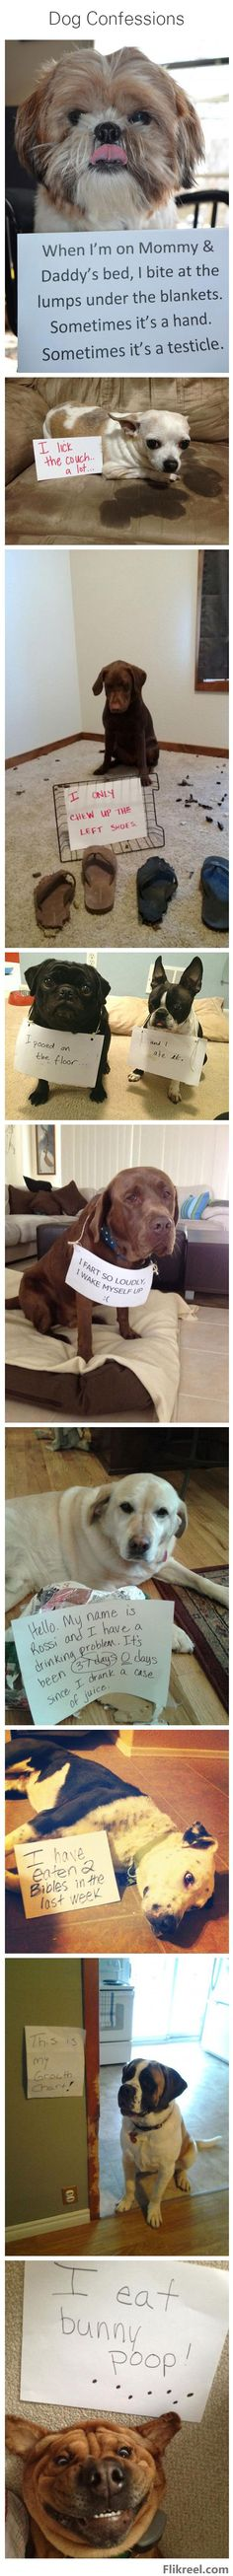 Dog confessions